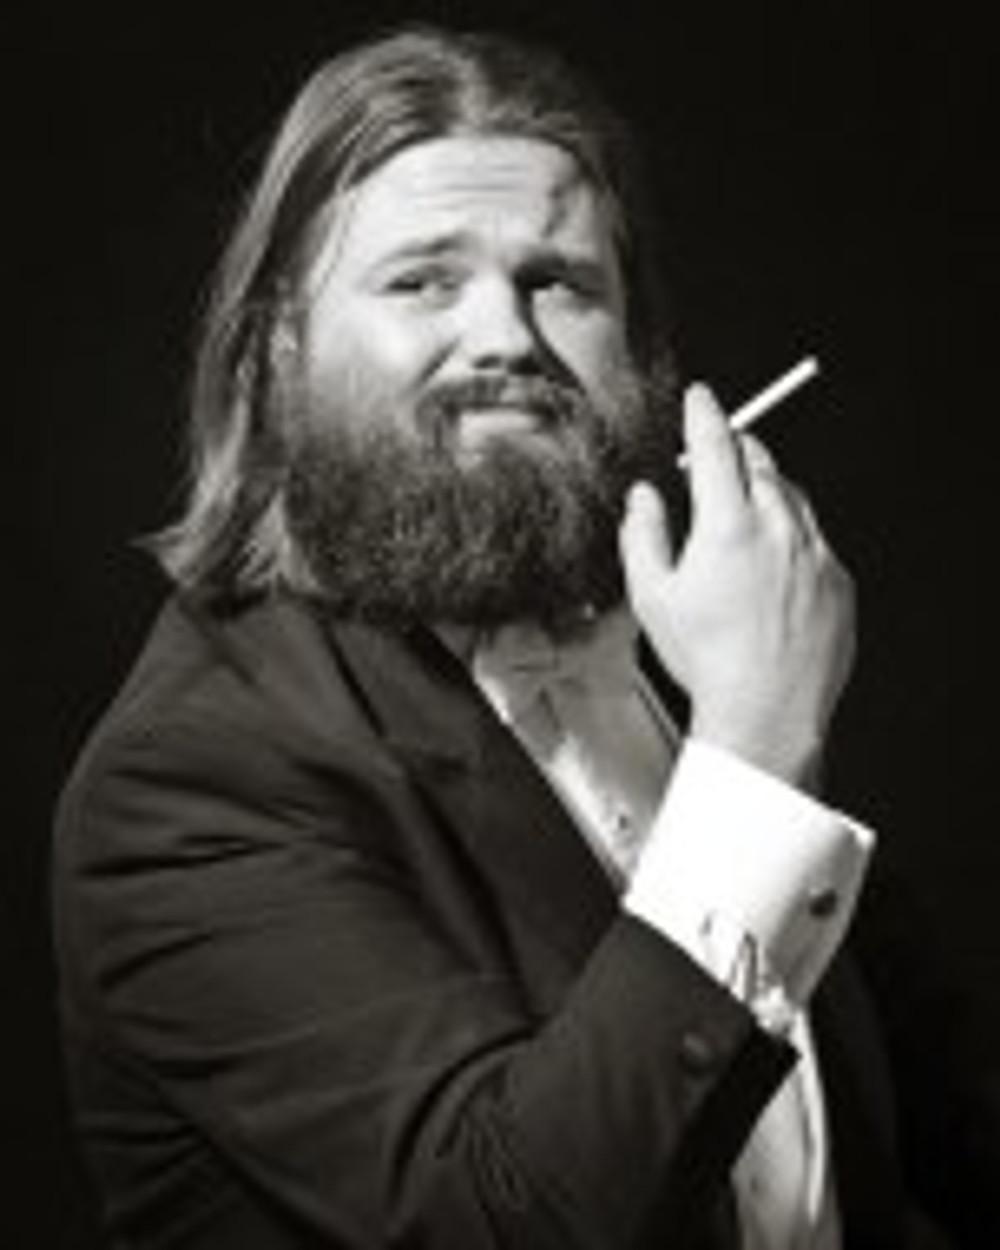 Gunnar Karel Másson